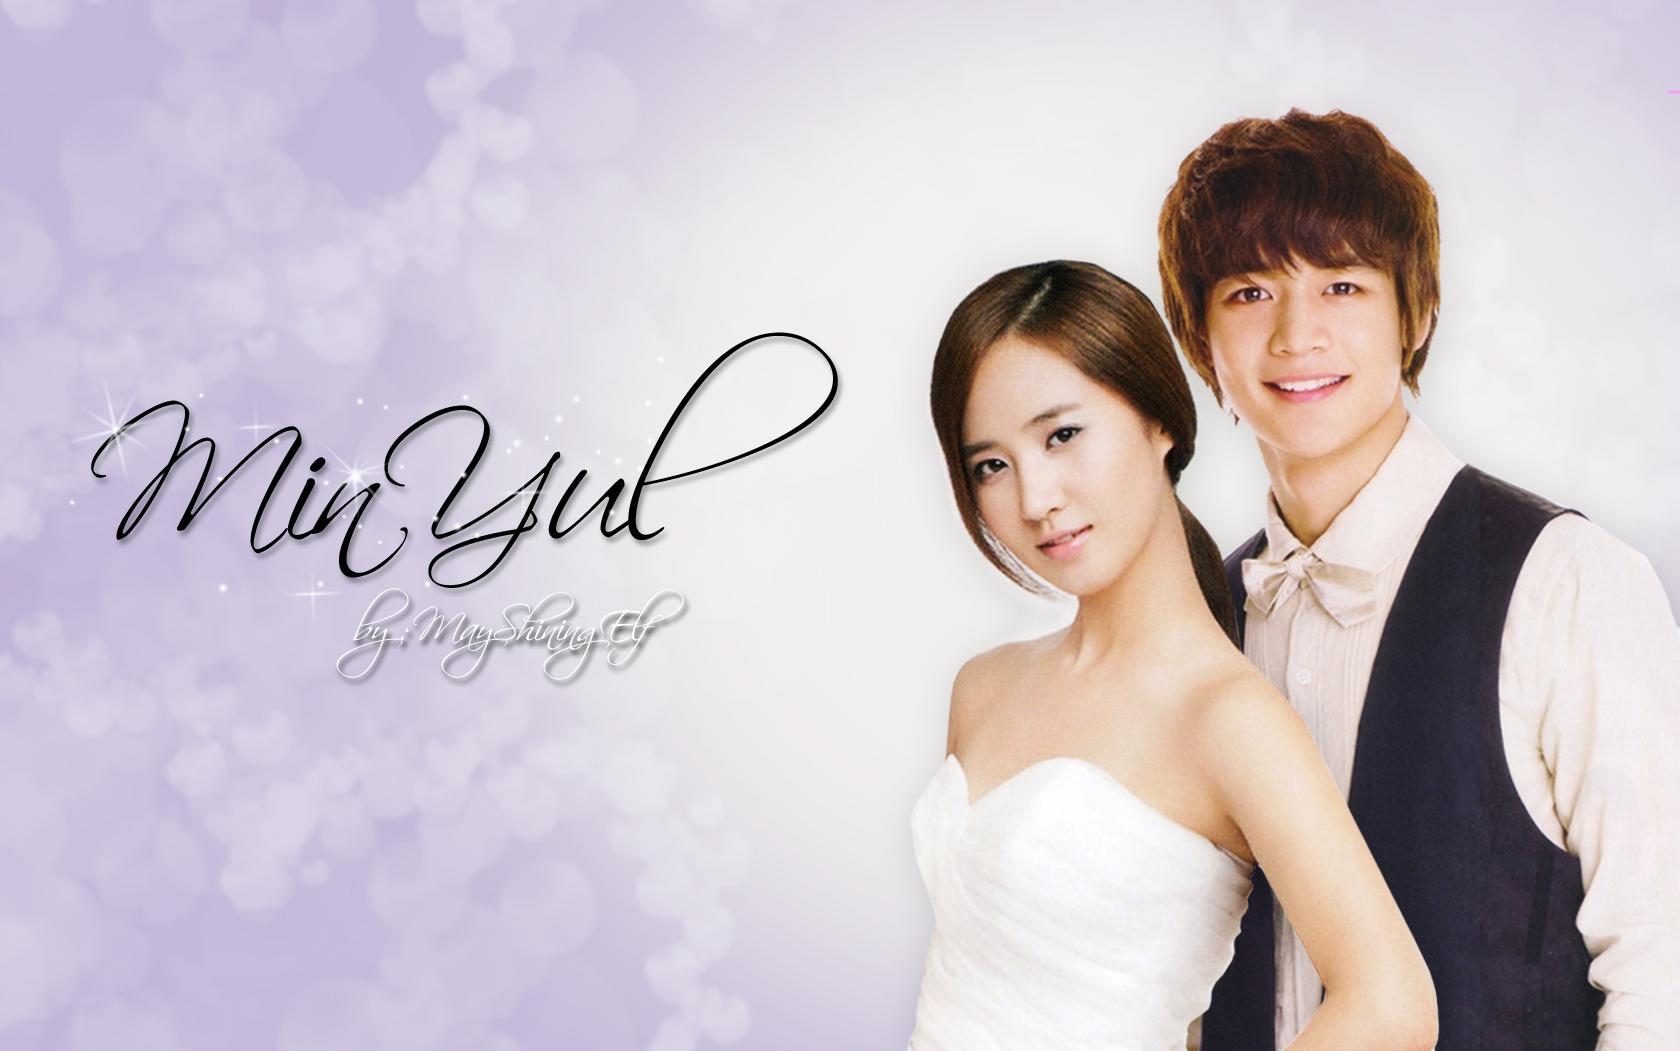 Minho Yuri Minyul Couple images MinYul HD wallpaper and